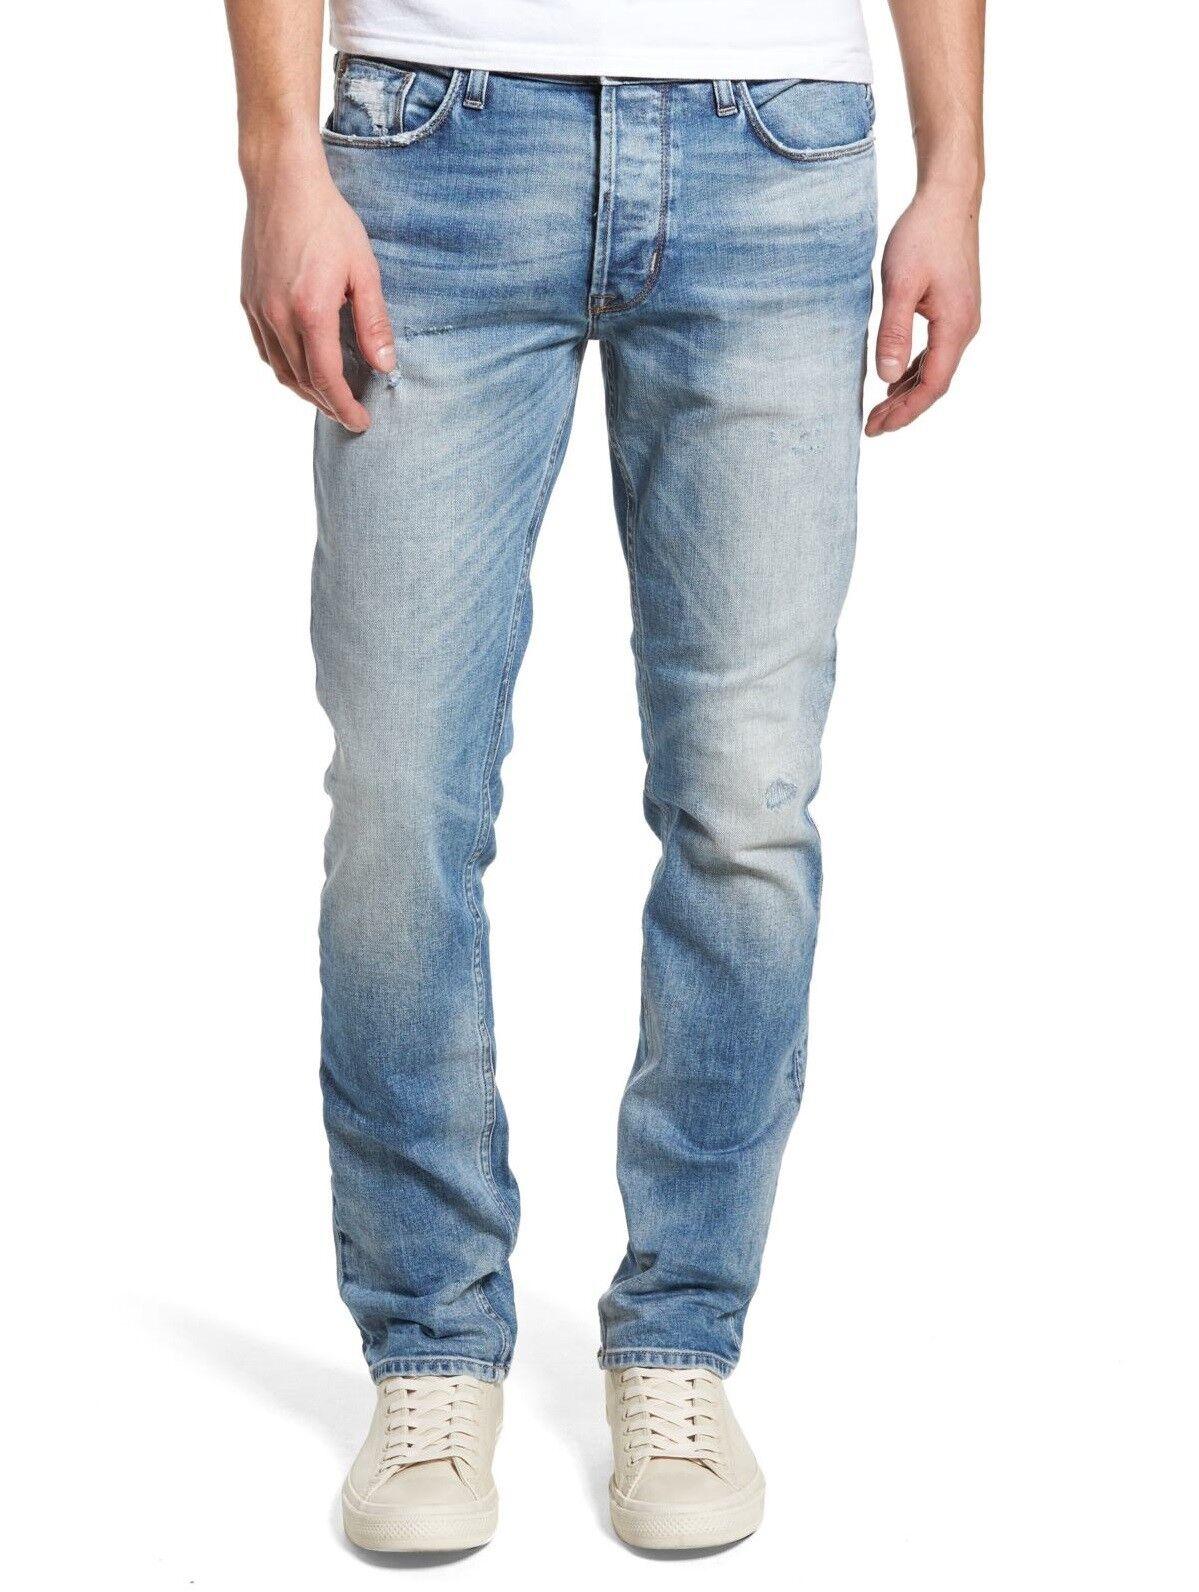 Hudson Jeans Men's Sartor Relaxed Skinny Leg Jeans Method Distressed Denim Mural